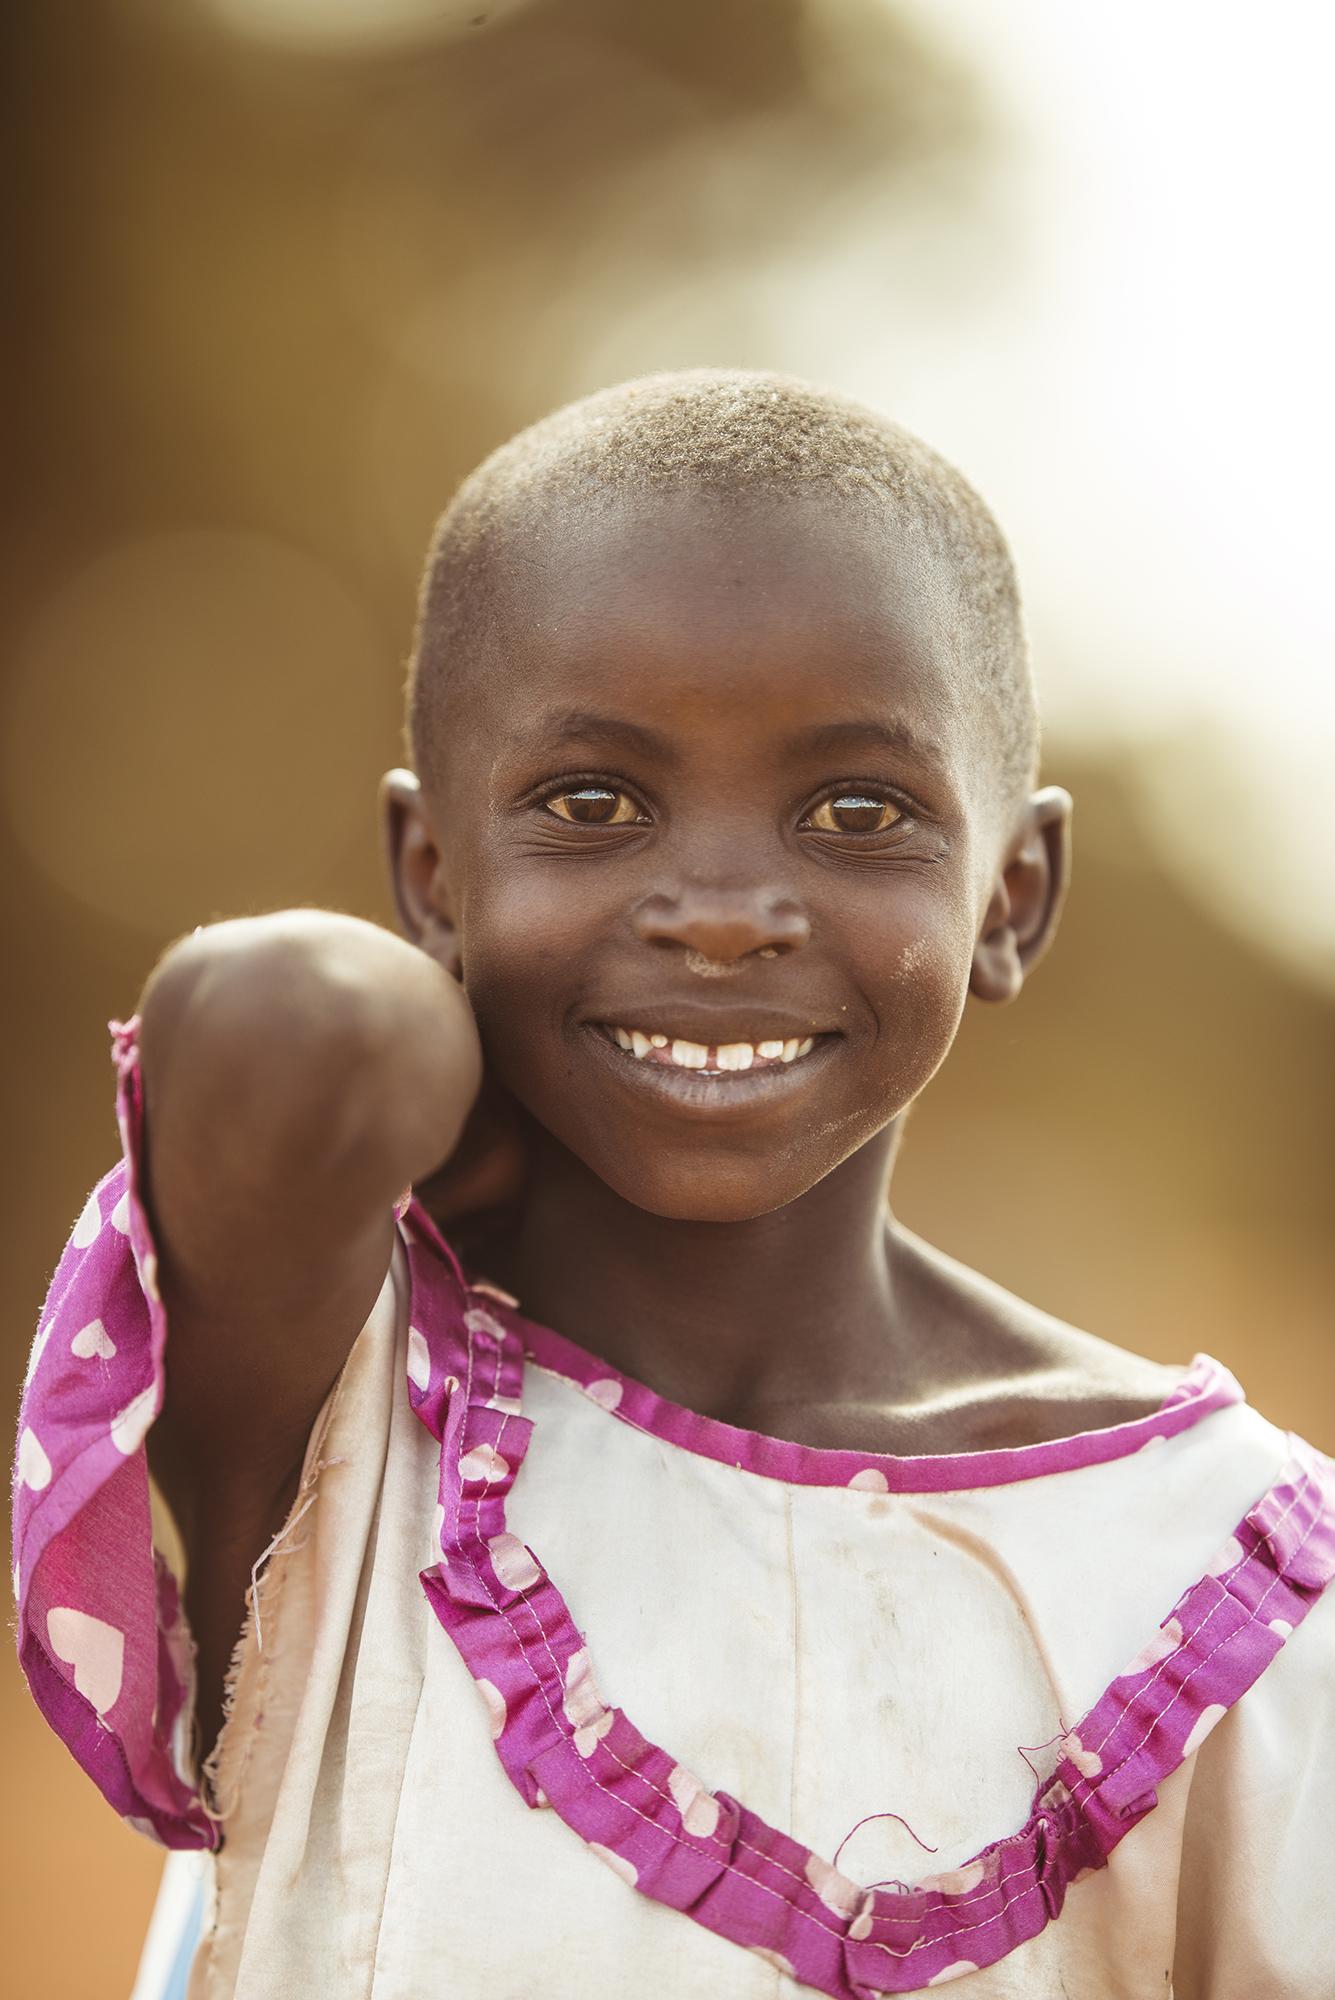 All smiles, Kenya.